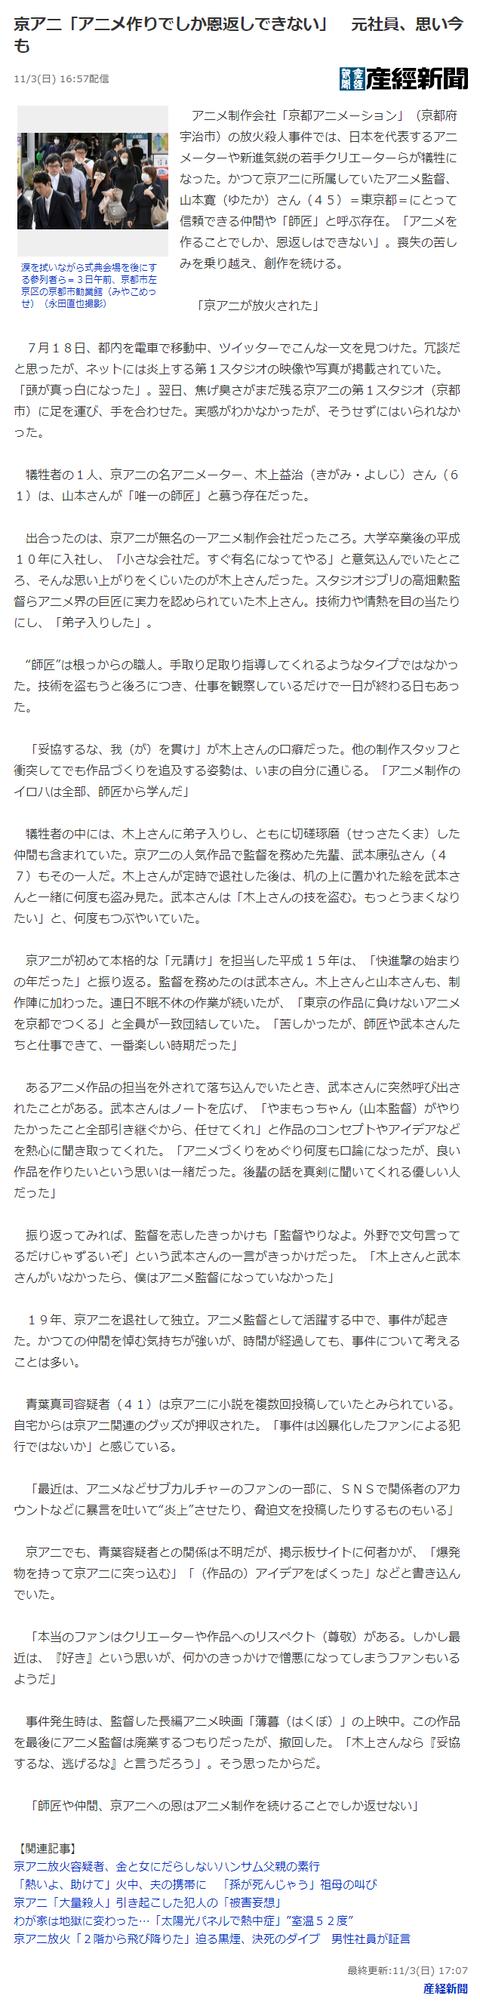 may.2chan.net_b_src_1572798753041